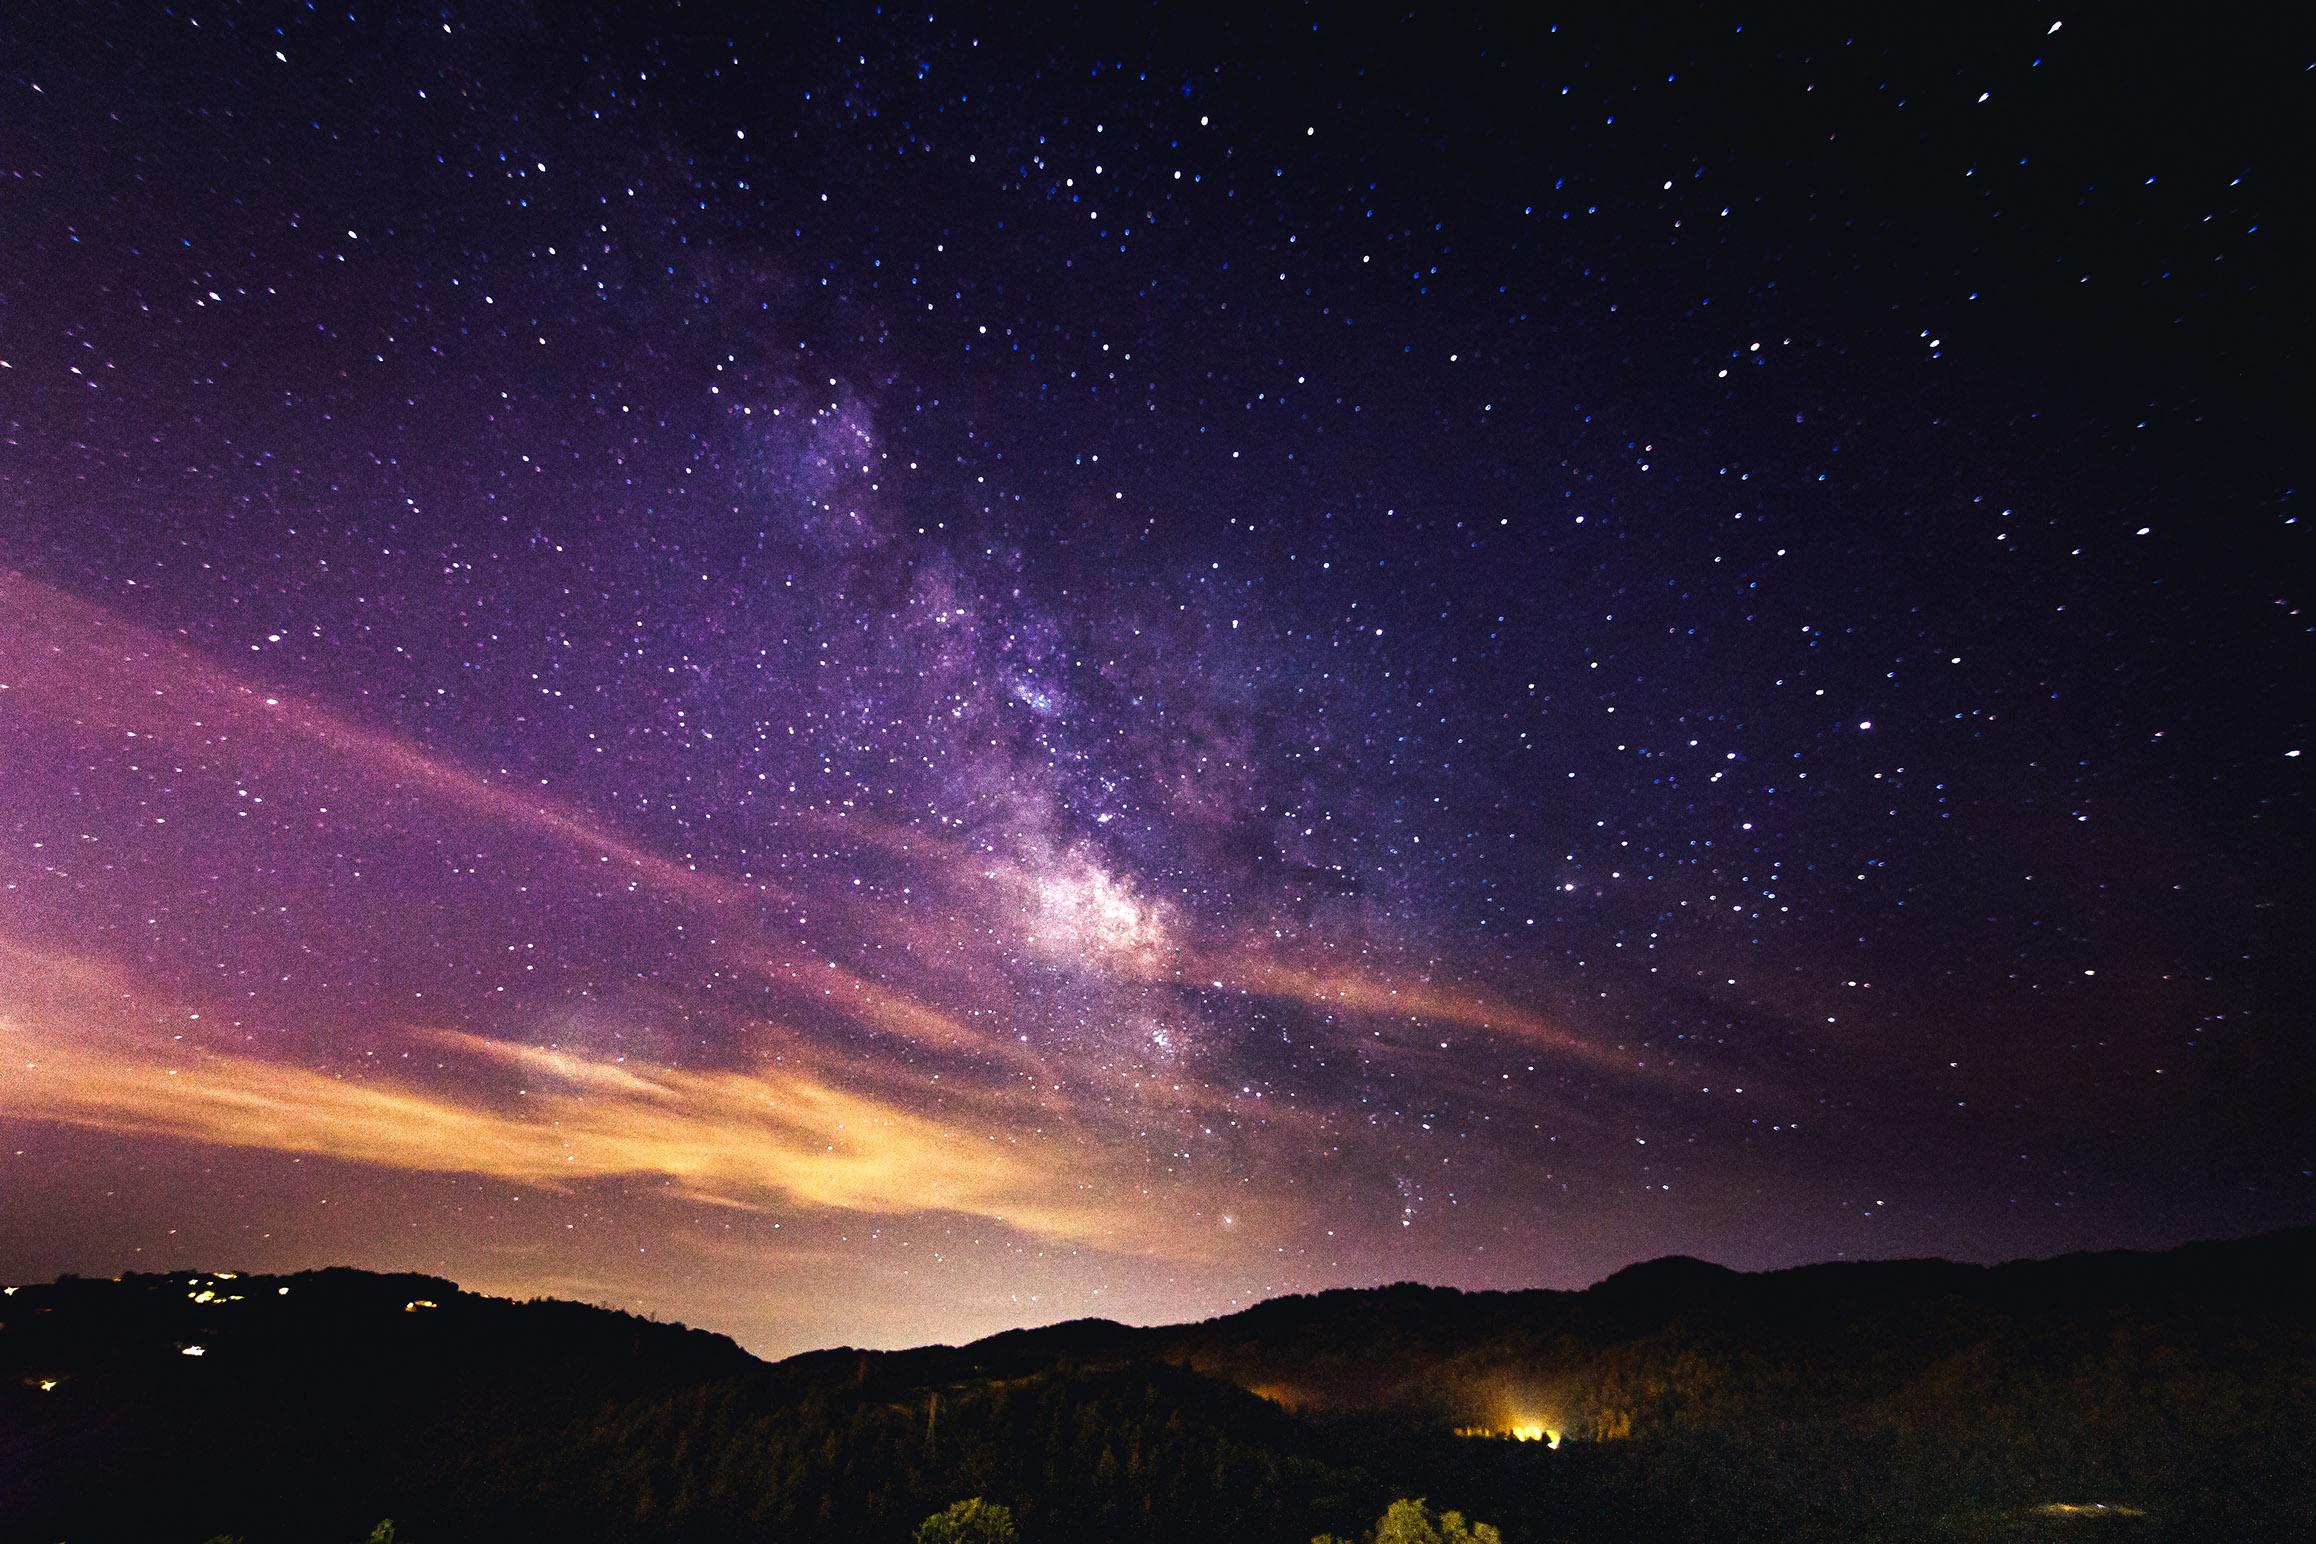 Lokasi terbaik untuk mengamati bintang